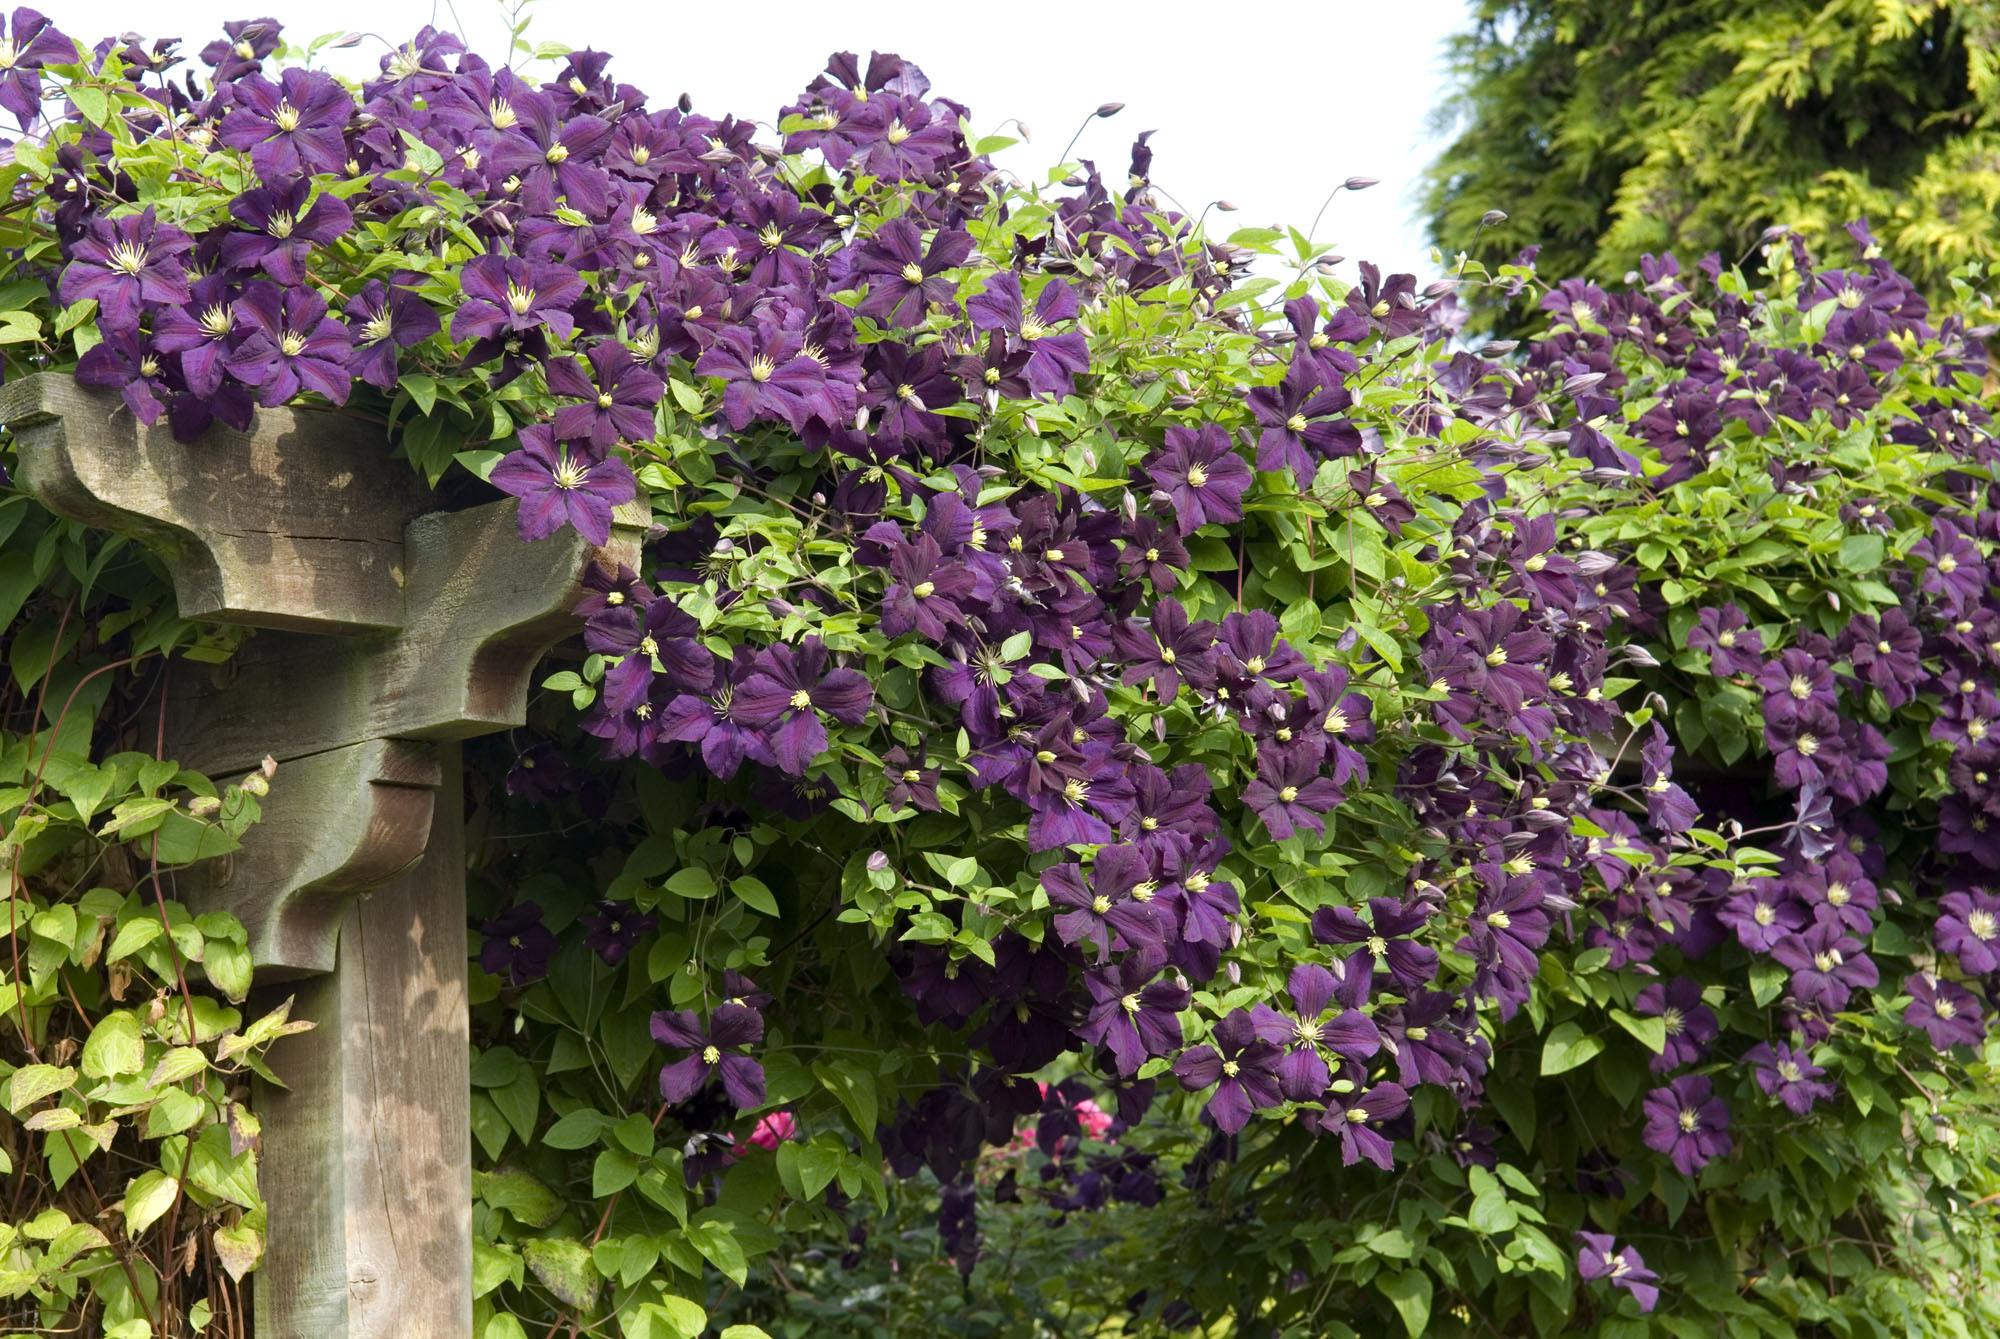 Michael king garden photographer 39 s association - Clematis viticella ...